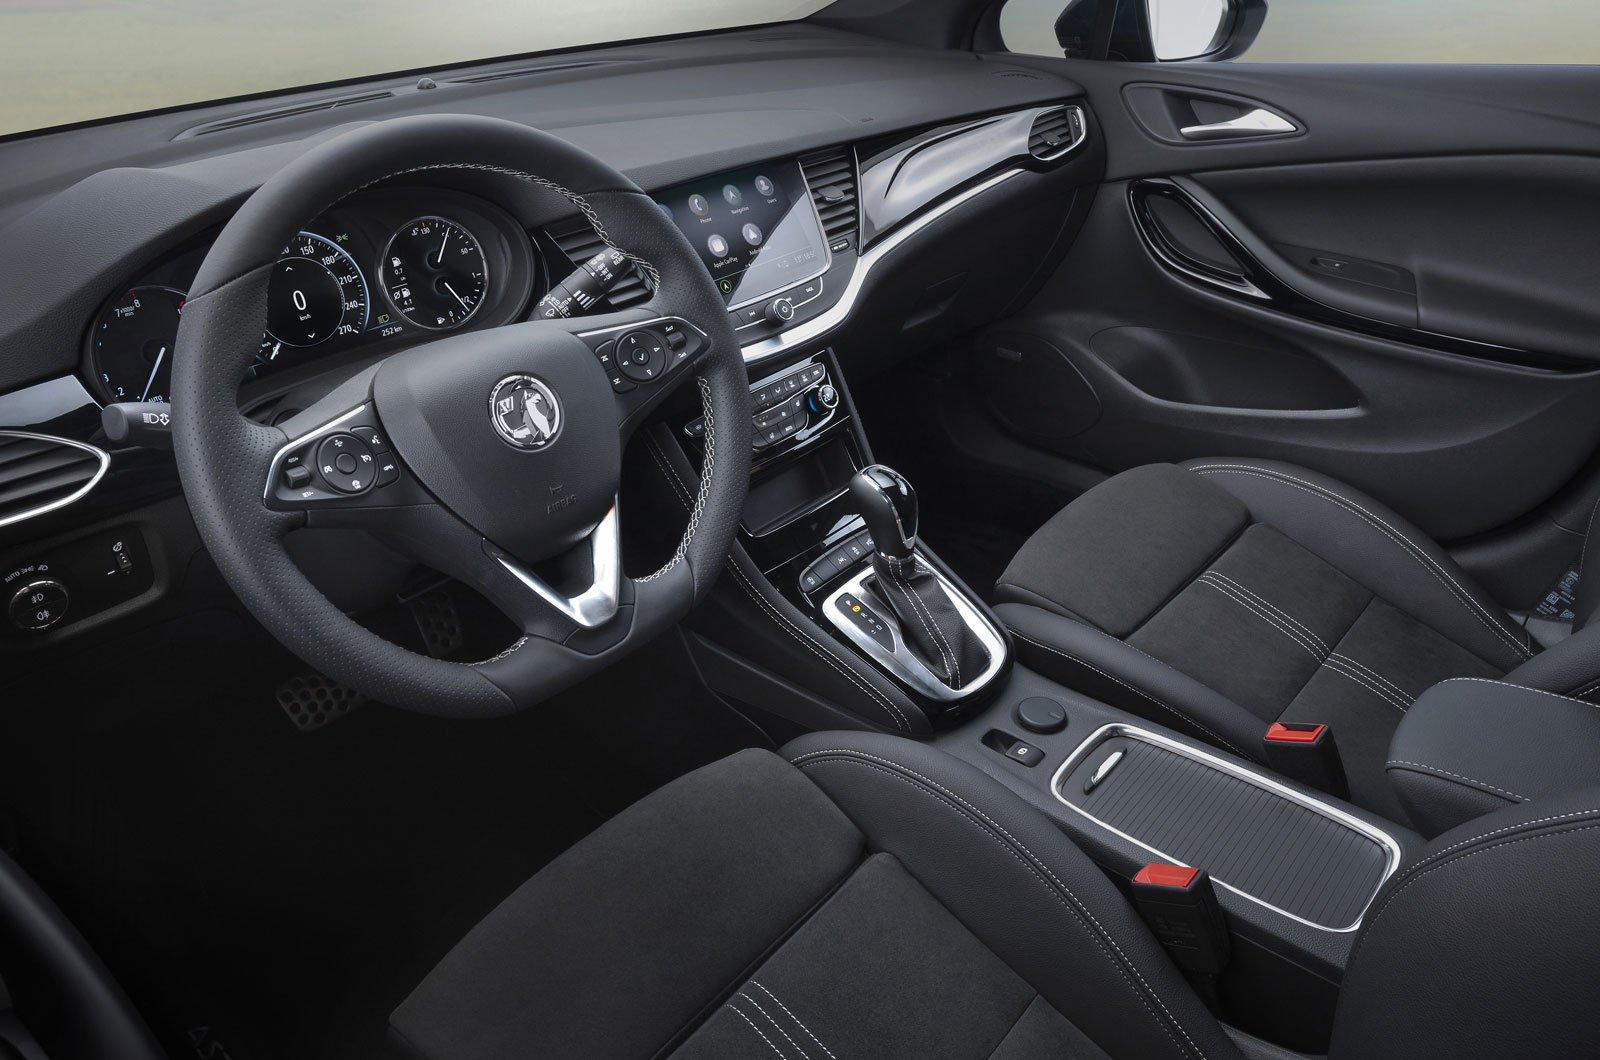 2019 Vauxhall Astra interior